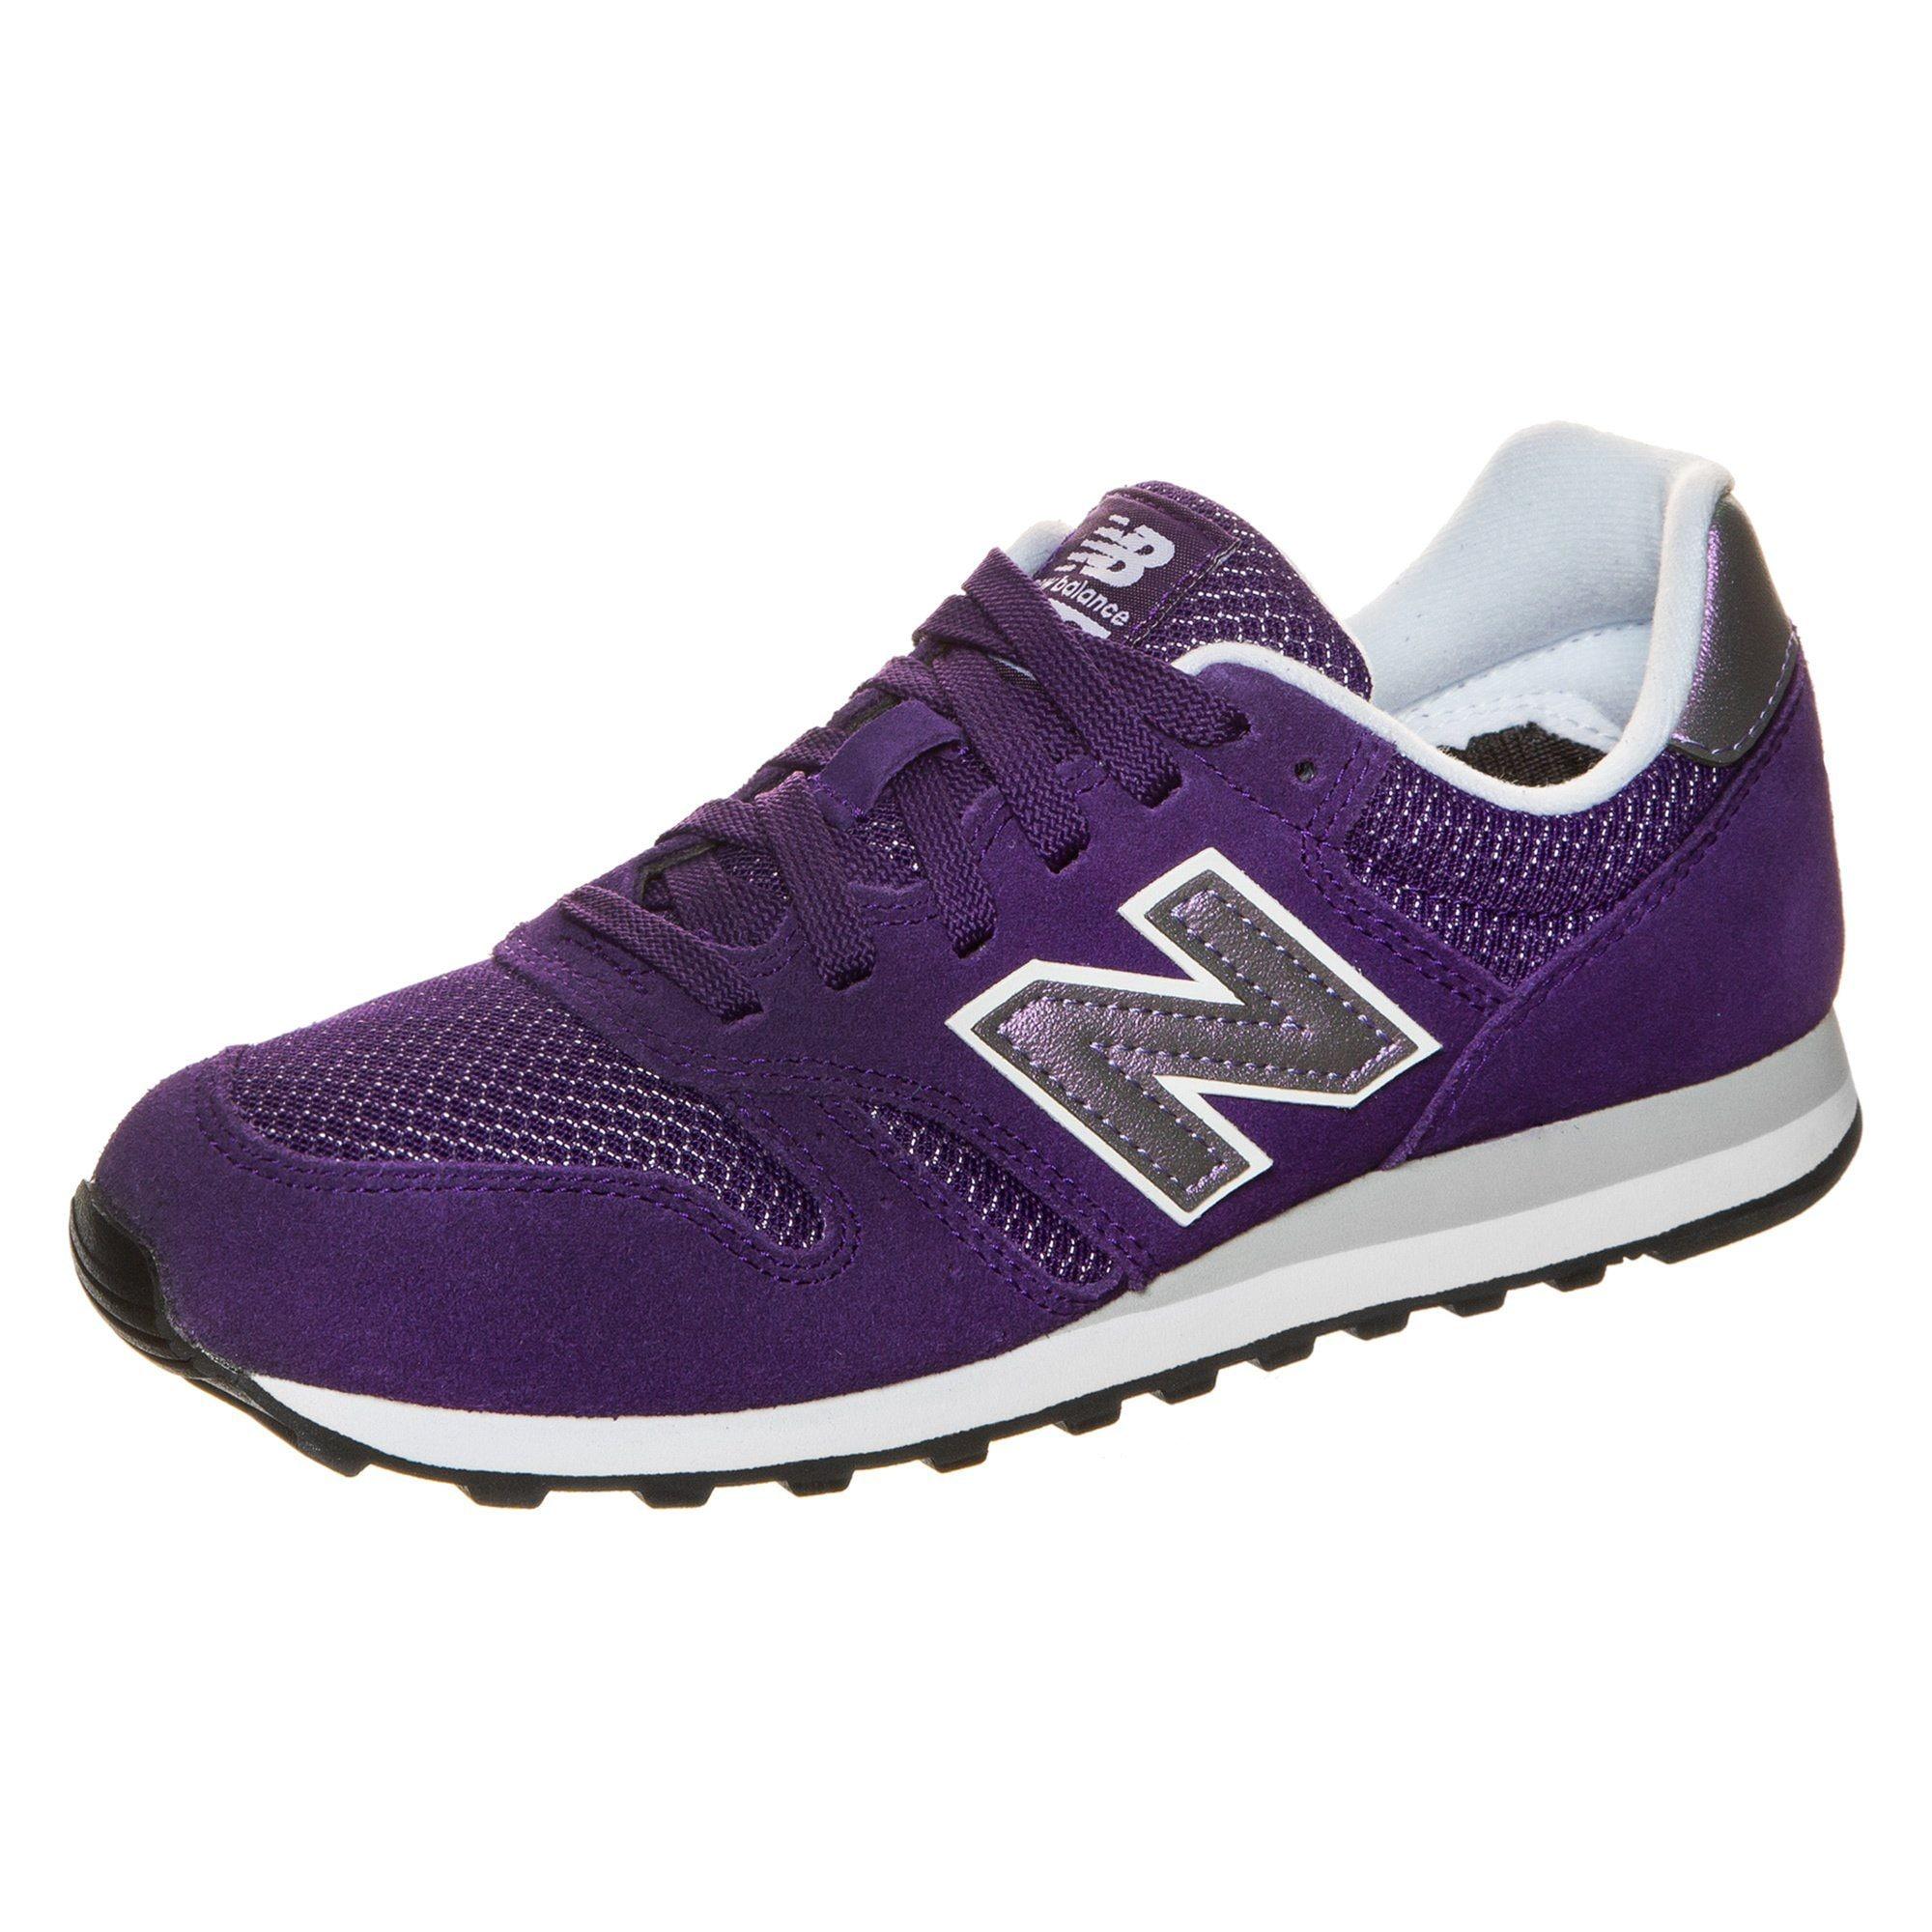 RechnungBaur B Sneaker New Wl373 Pi Balance Per Damen dxBCeo